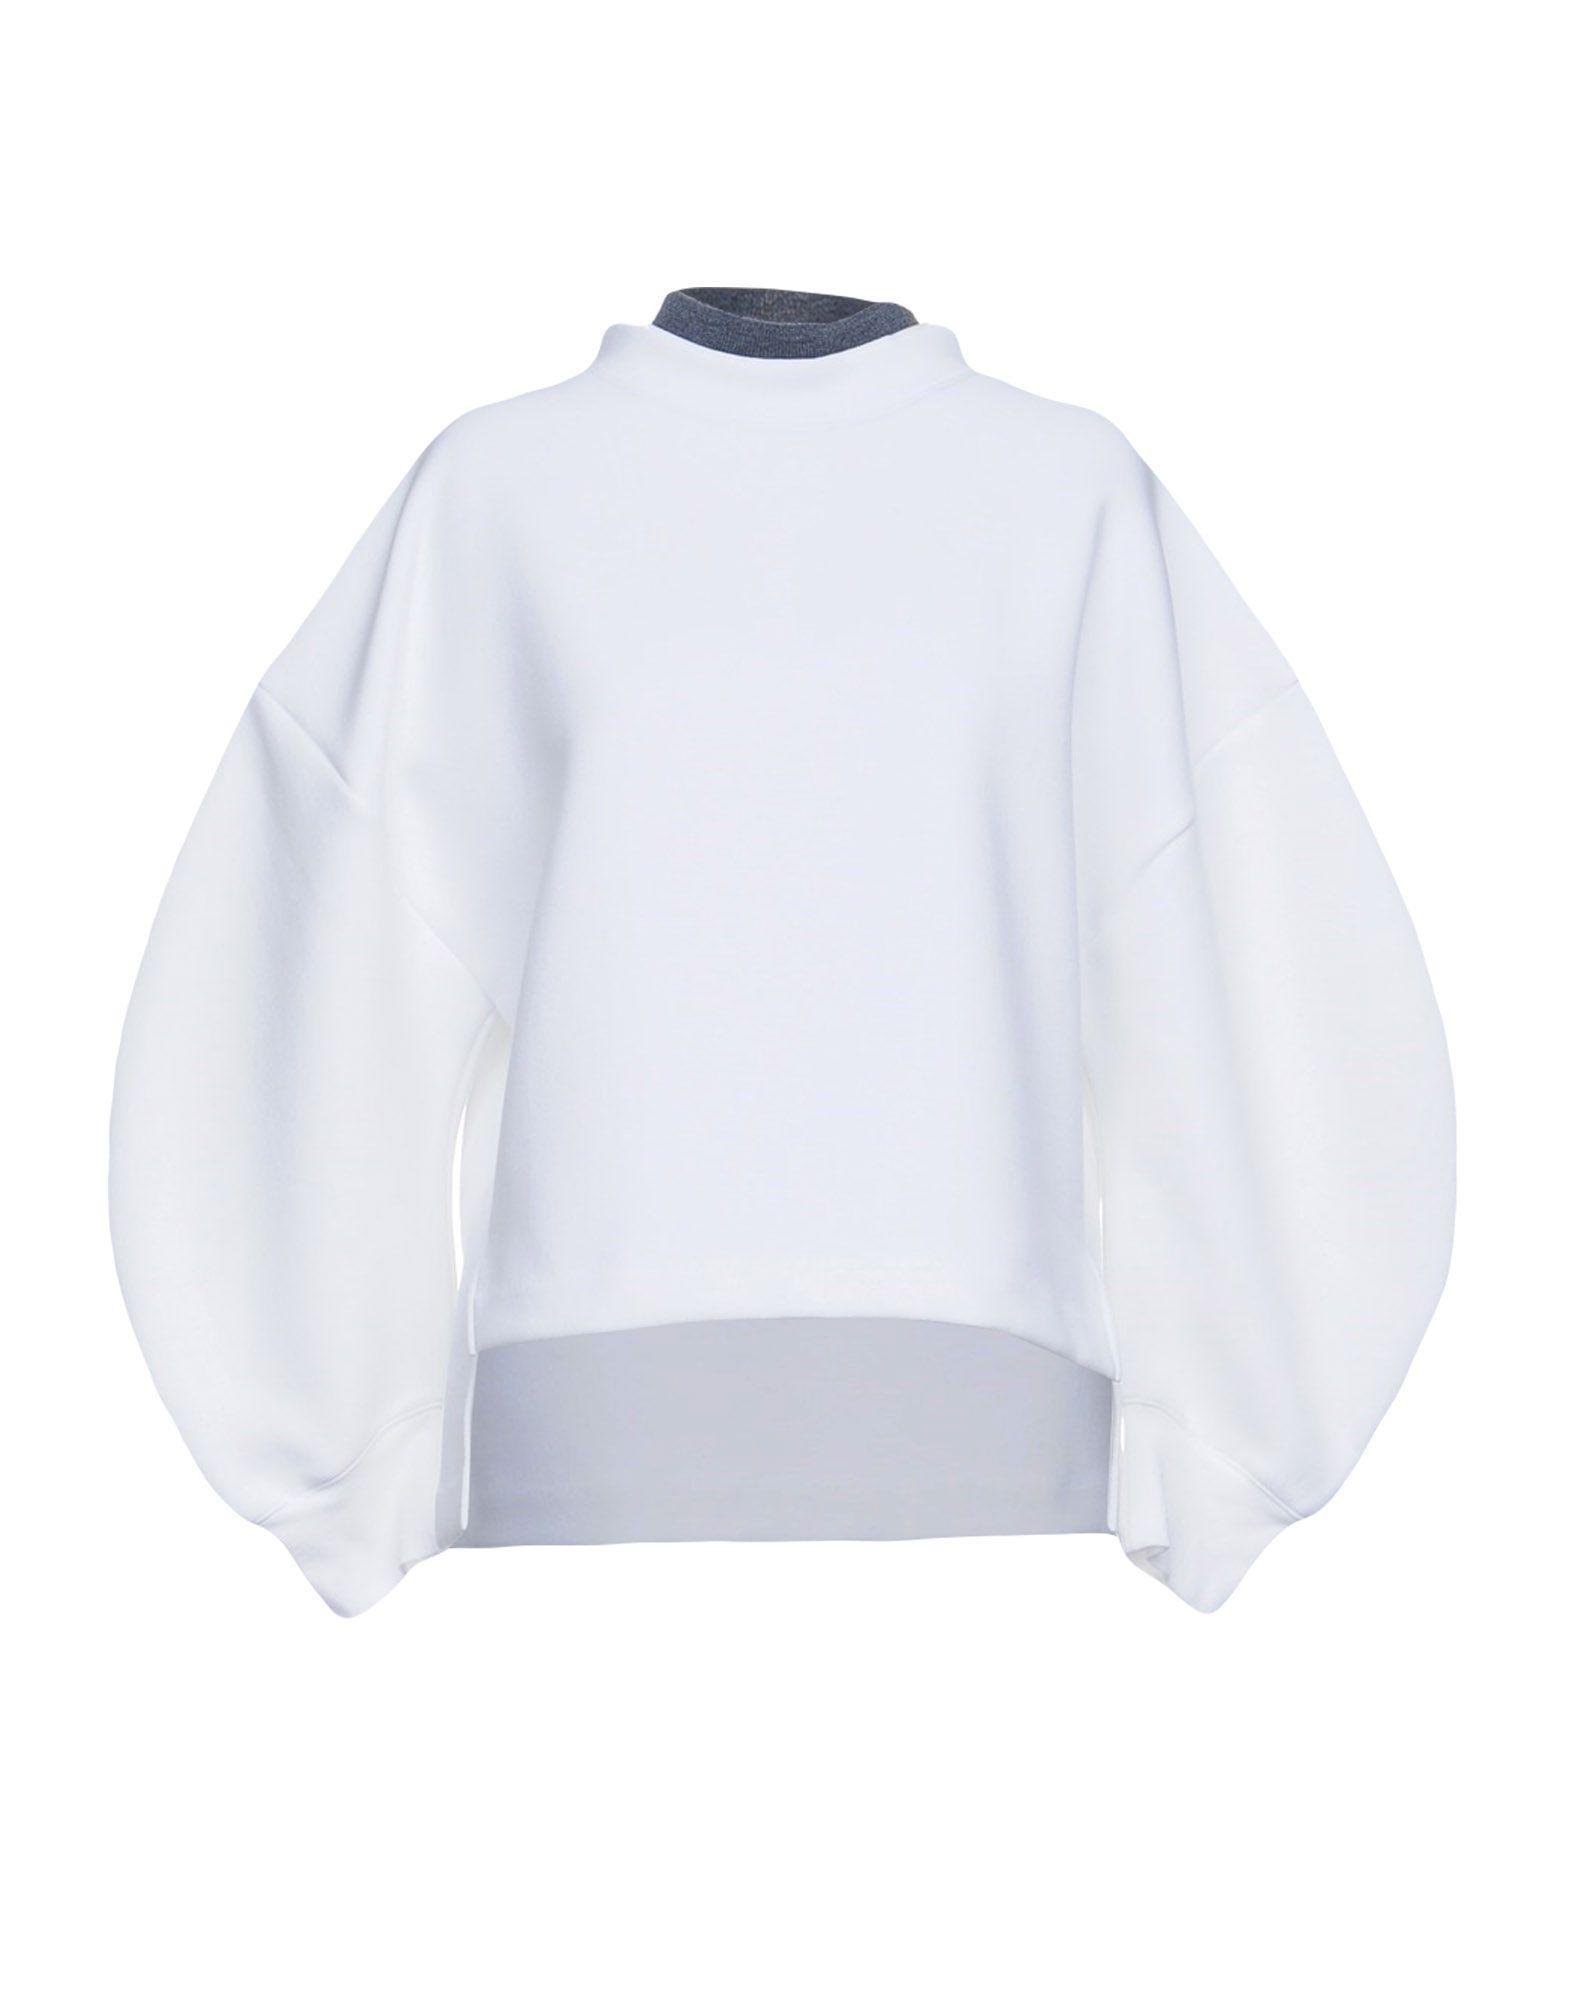 EnfÖld Sweatshirt In White